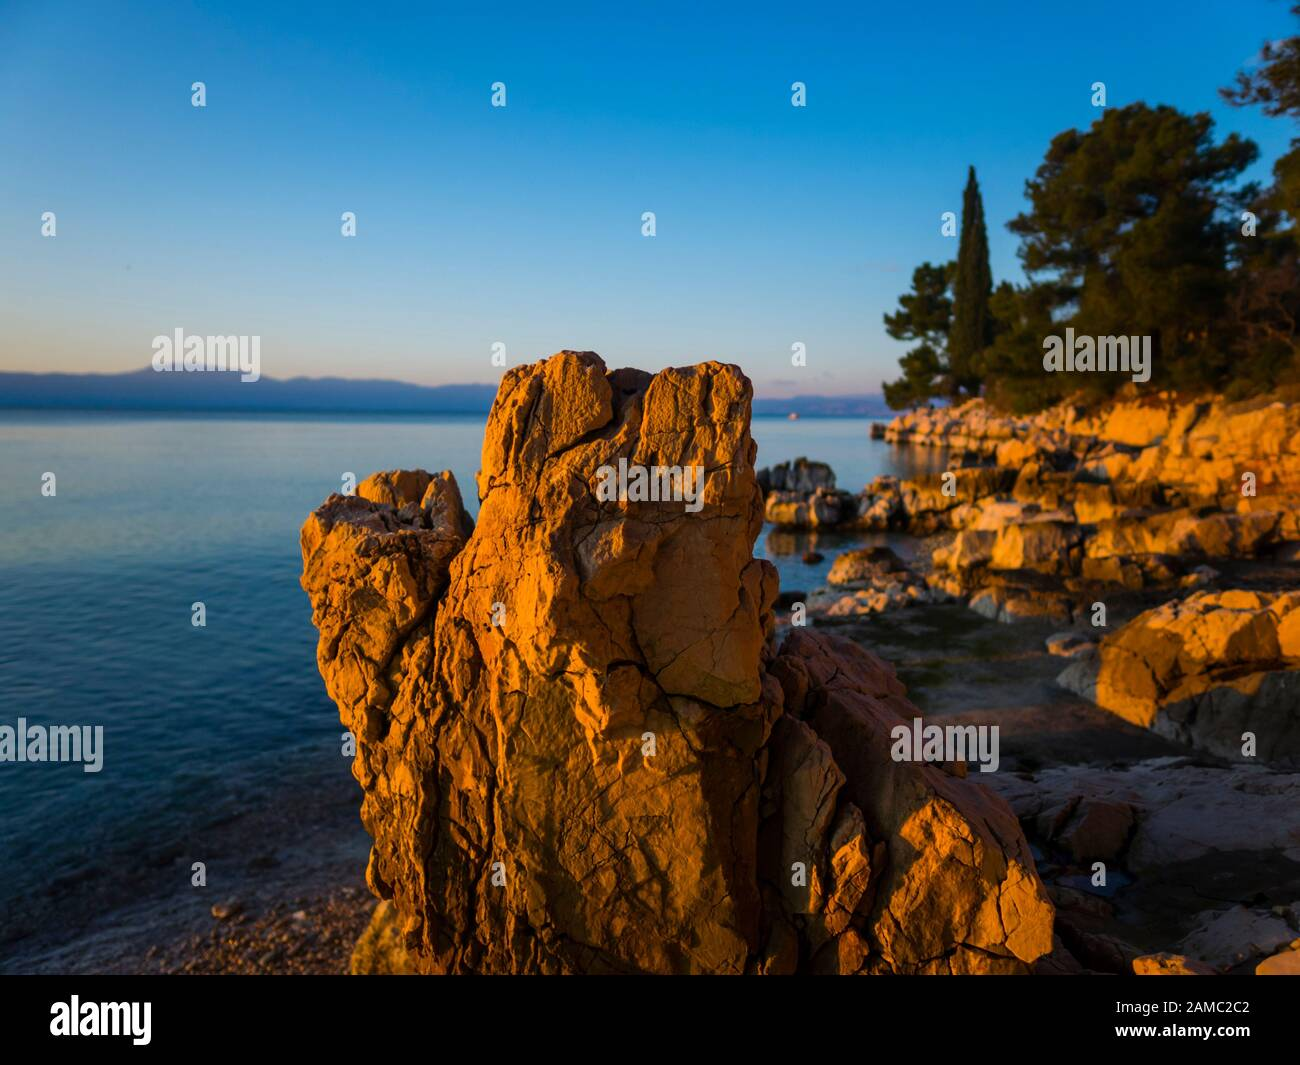 Sunset lighted light on boulder rock on beach seaside before coastline promenade Malinska on island Krk in Croatia Europe Stock Photo